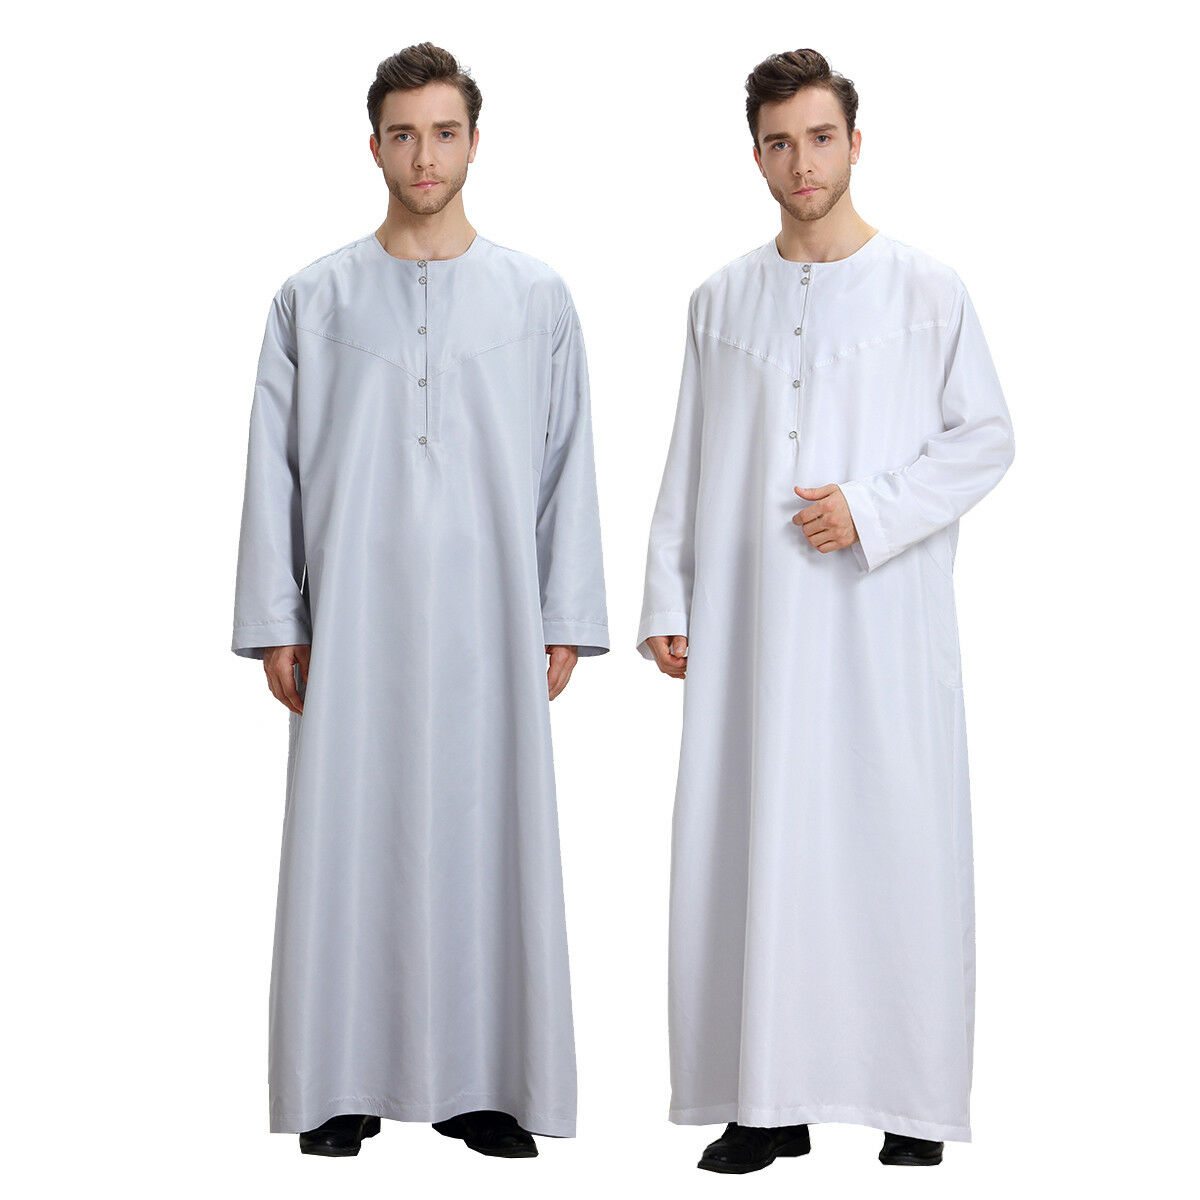 Muslim Men Long Sleeve Thobe Saudi Arab Kaftan Islamic Abaya Dress Dubai Robe